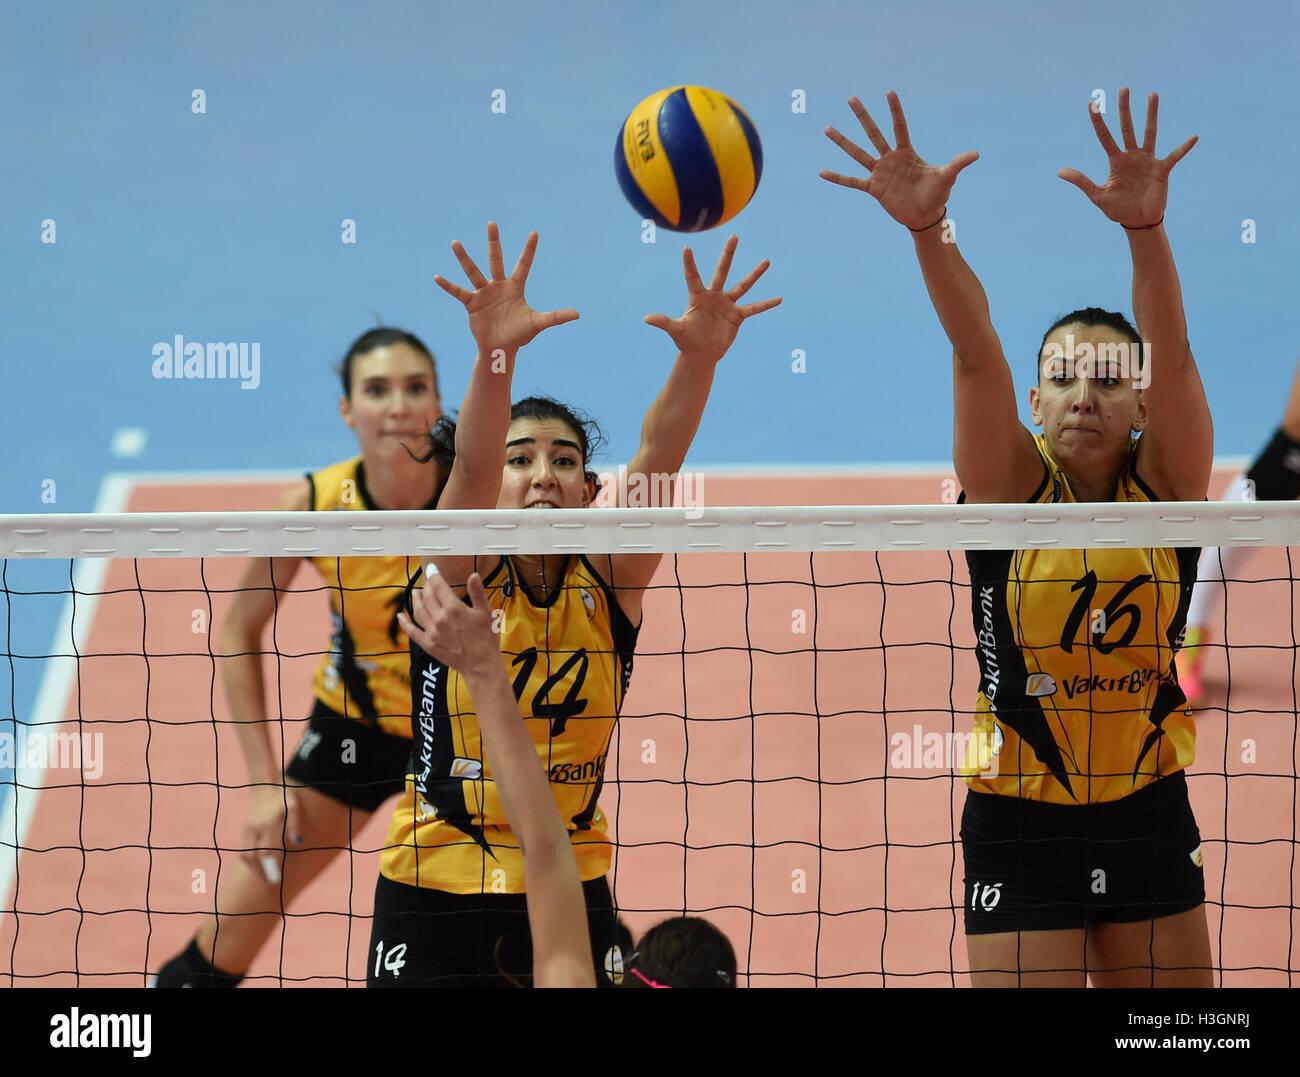 (161009) -- ISTANBUL, Oct. 9, 2016(Xinhua) -- Vakifbank player Milena Rasic (R) and Melis Durul block the ball during Stock Foto